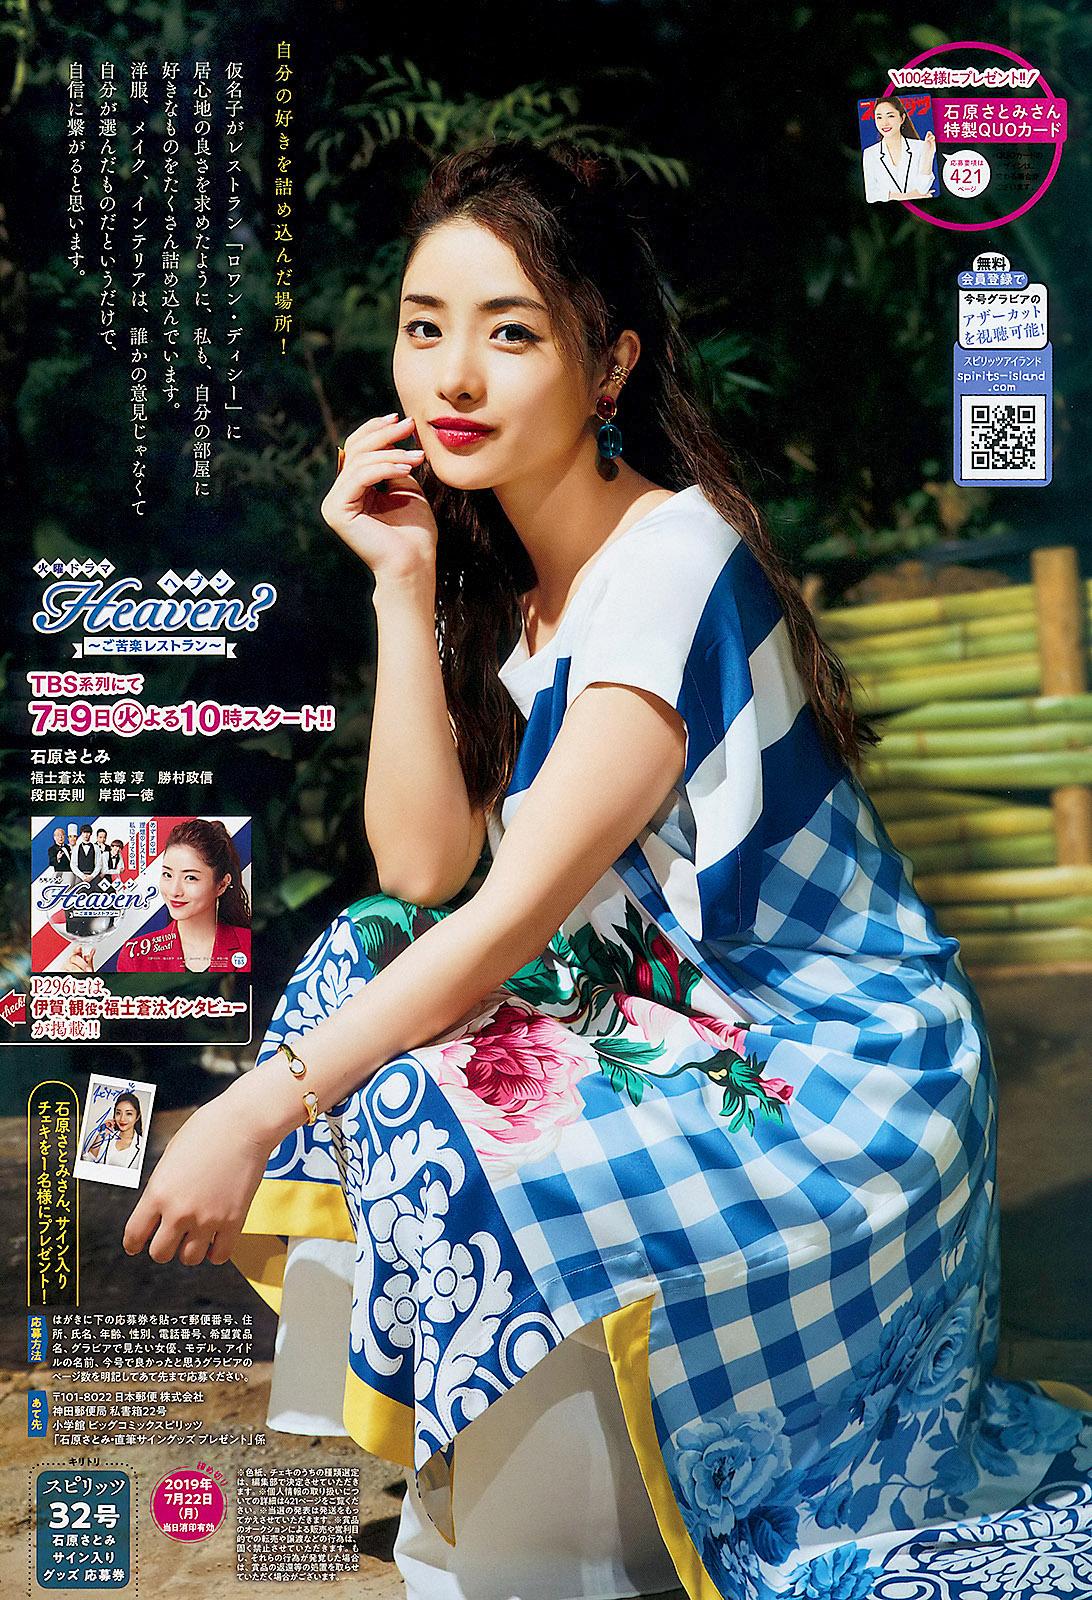 Satomi Ishihara Big Comic Spirits 190722 06.jpg